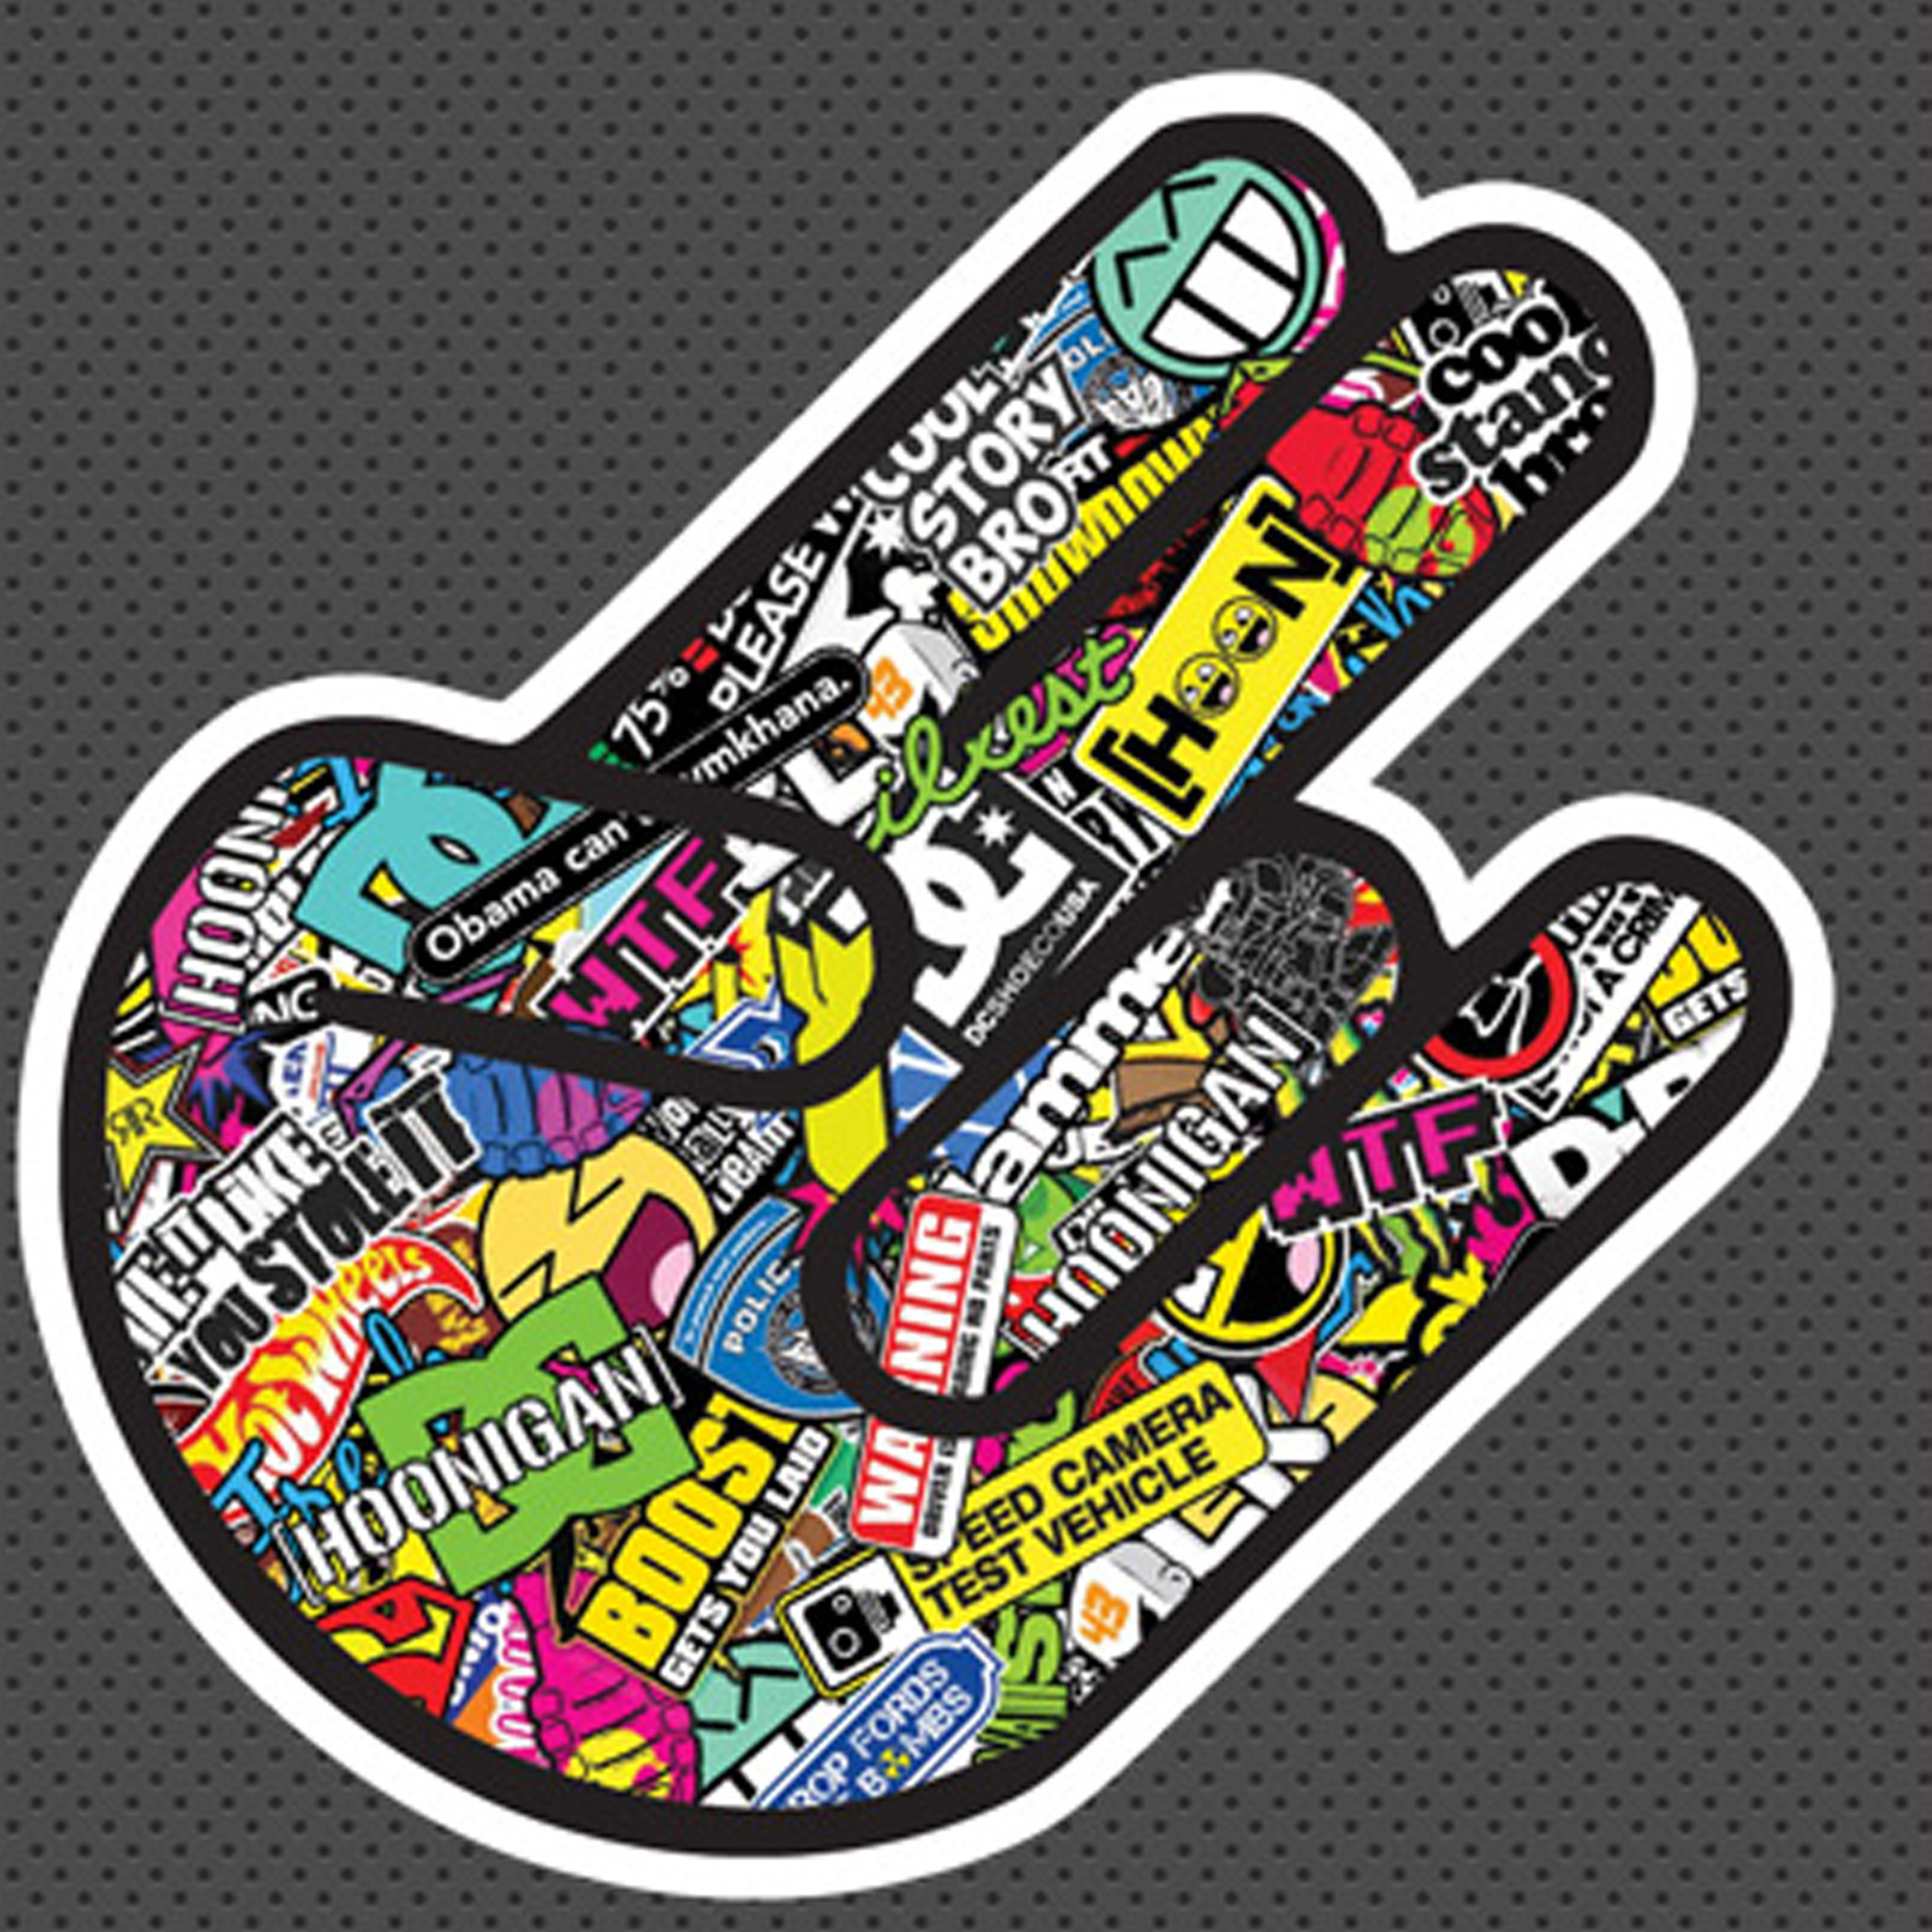 Jdm Sticker Bomb Wallpaper (45+ images)